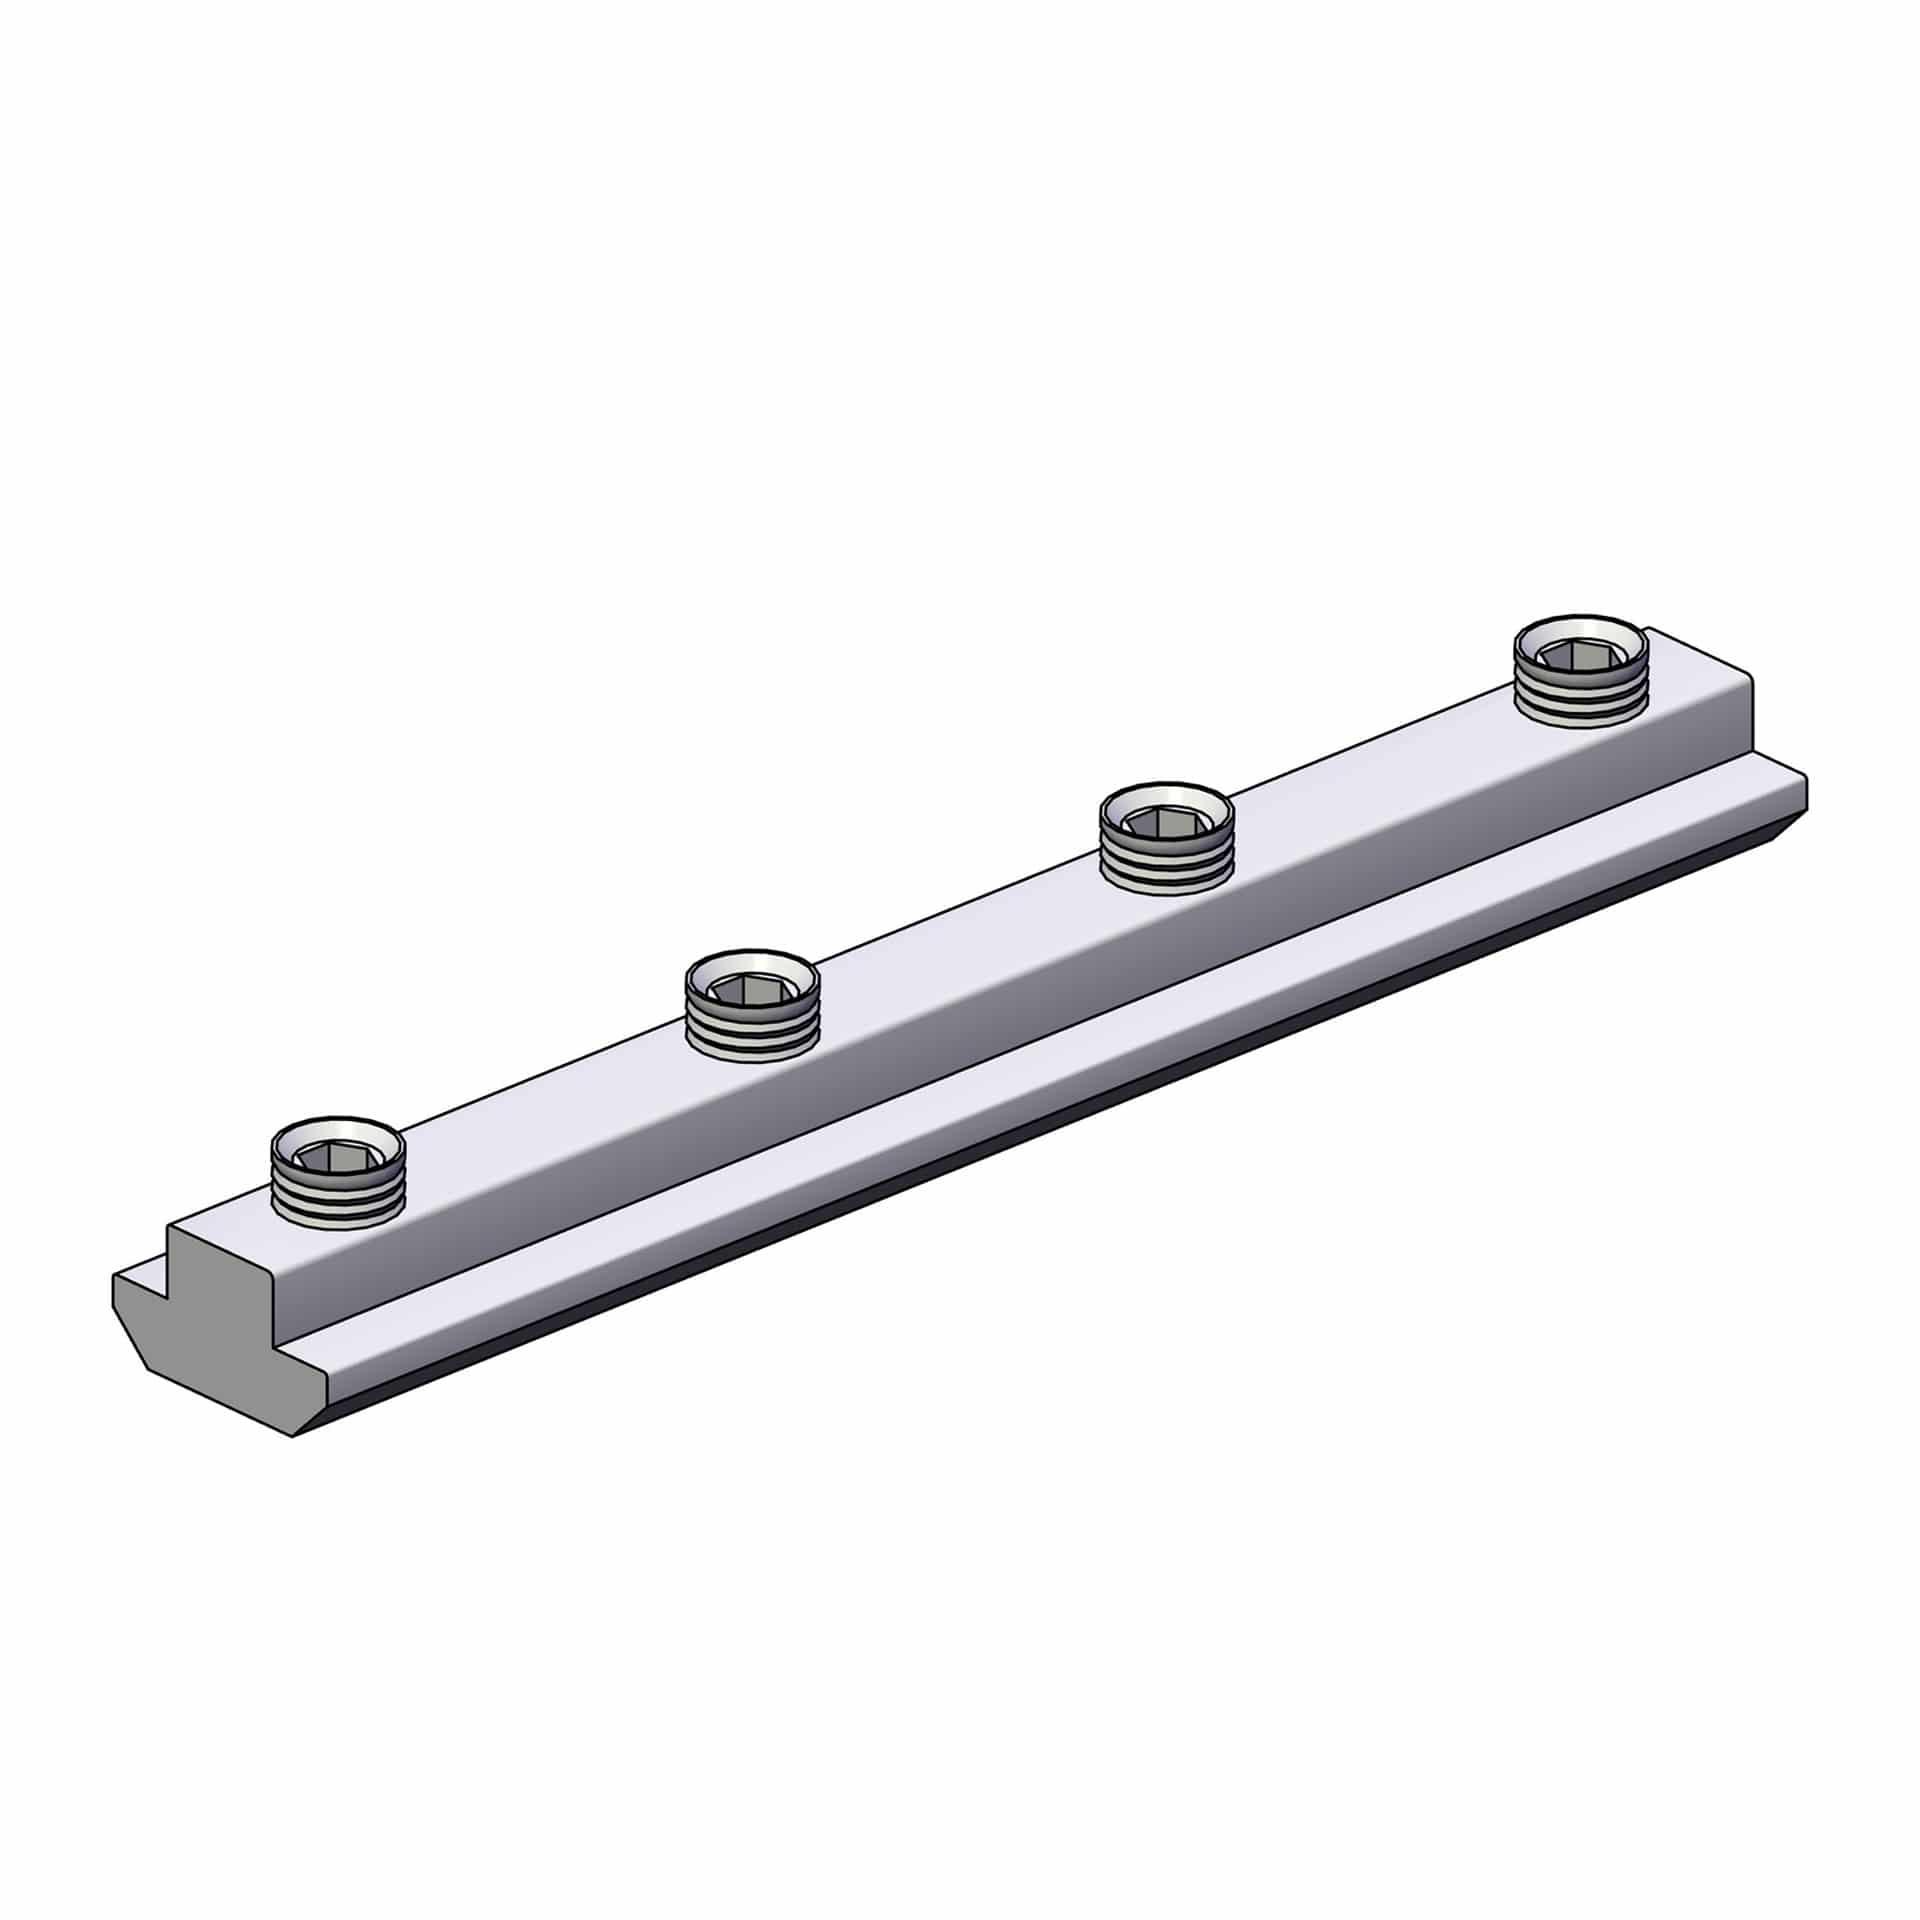 Standardlaengsverbinder_online